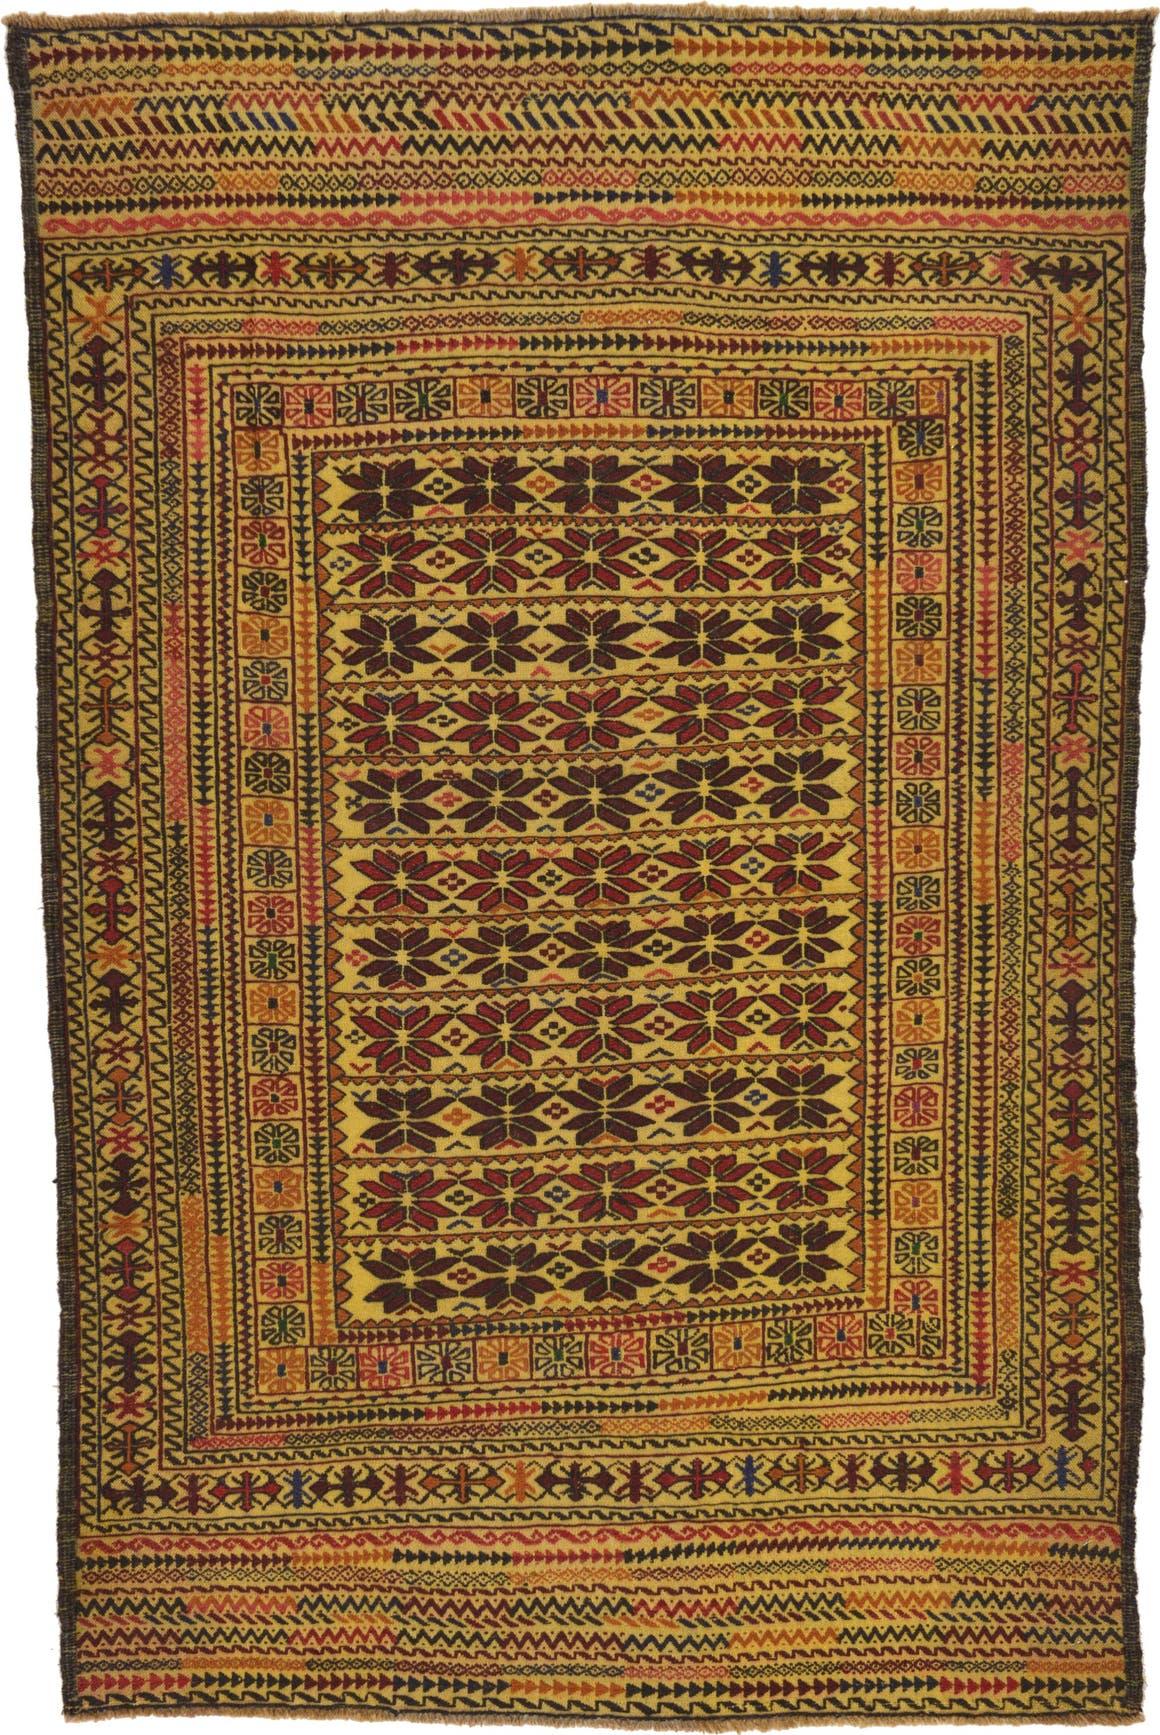 4' 3 x 6' 6 Kilim Afghan Rug main image